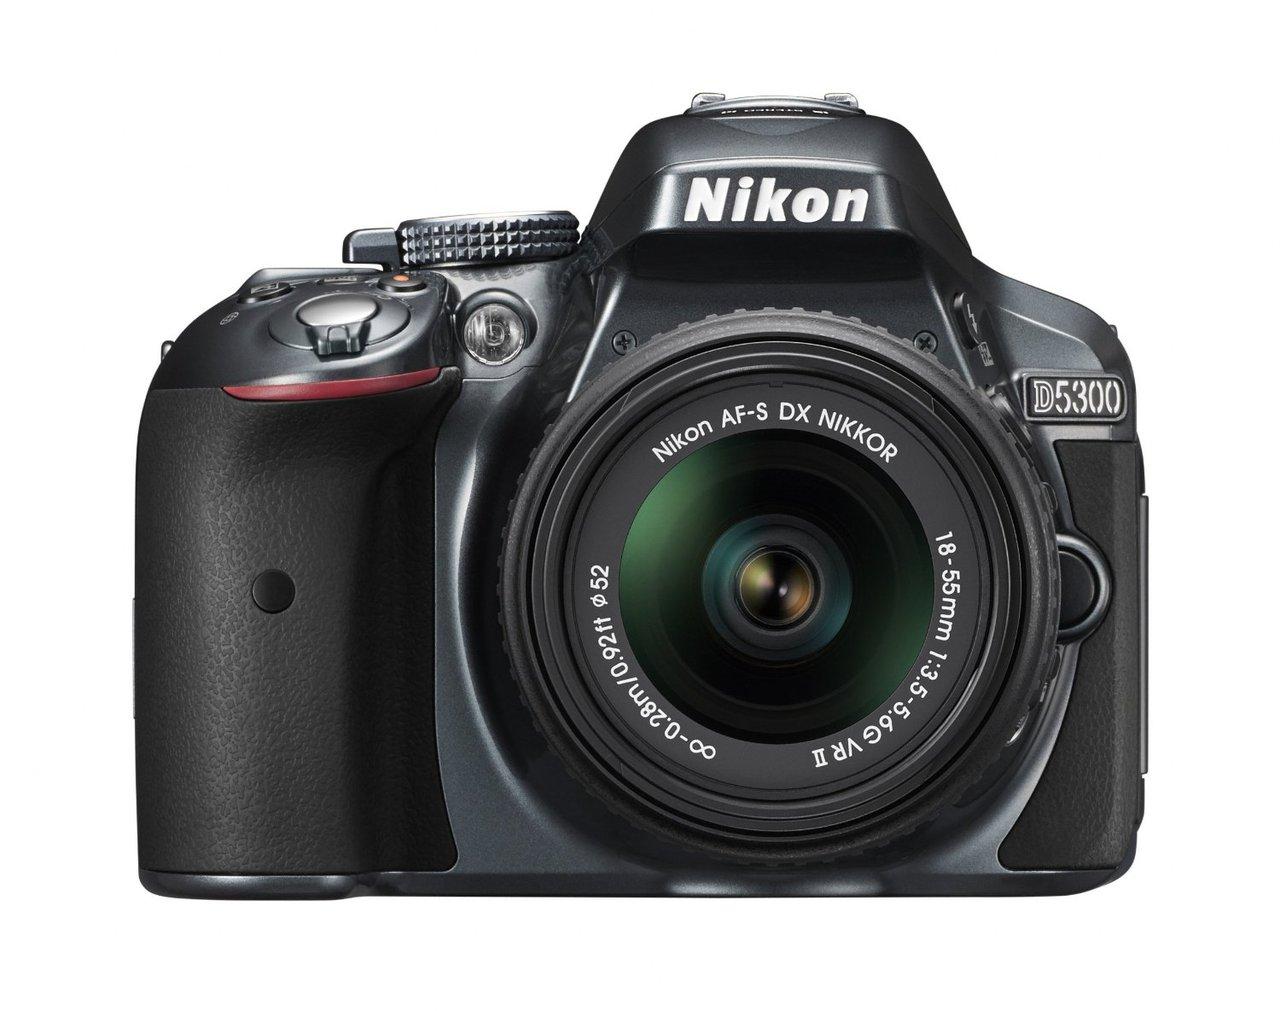 Nikon D5300 DSLR Camera Body Only Grey